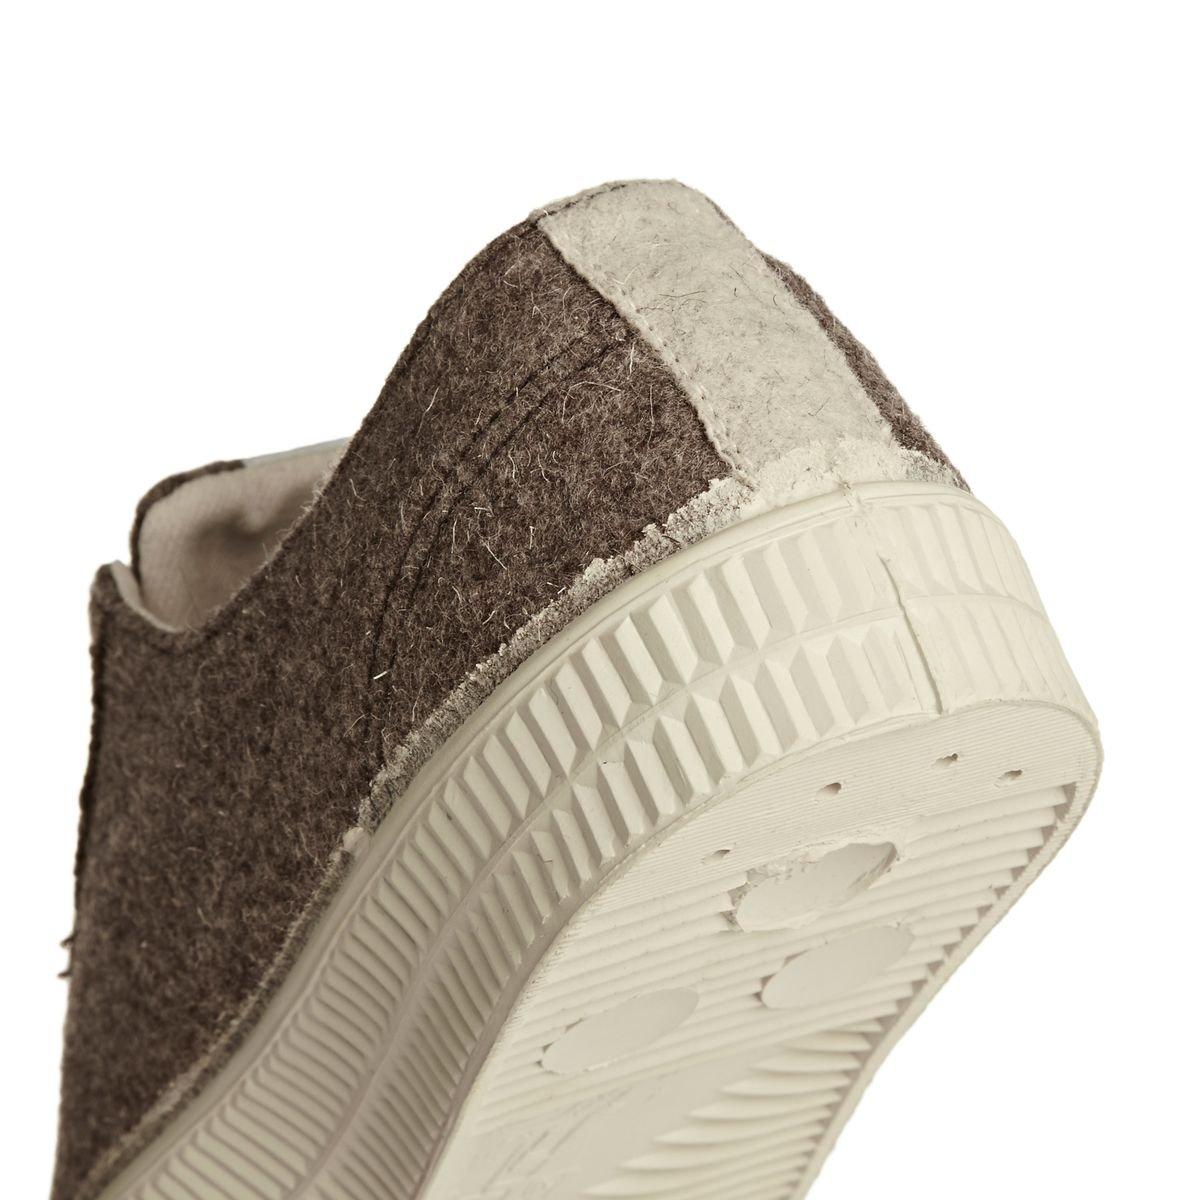 Sarubeco106 it Master EcruAmazon Uw Felt Novesta Star Sneaker gvf76yYb